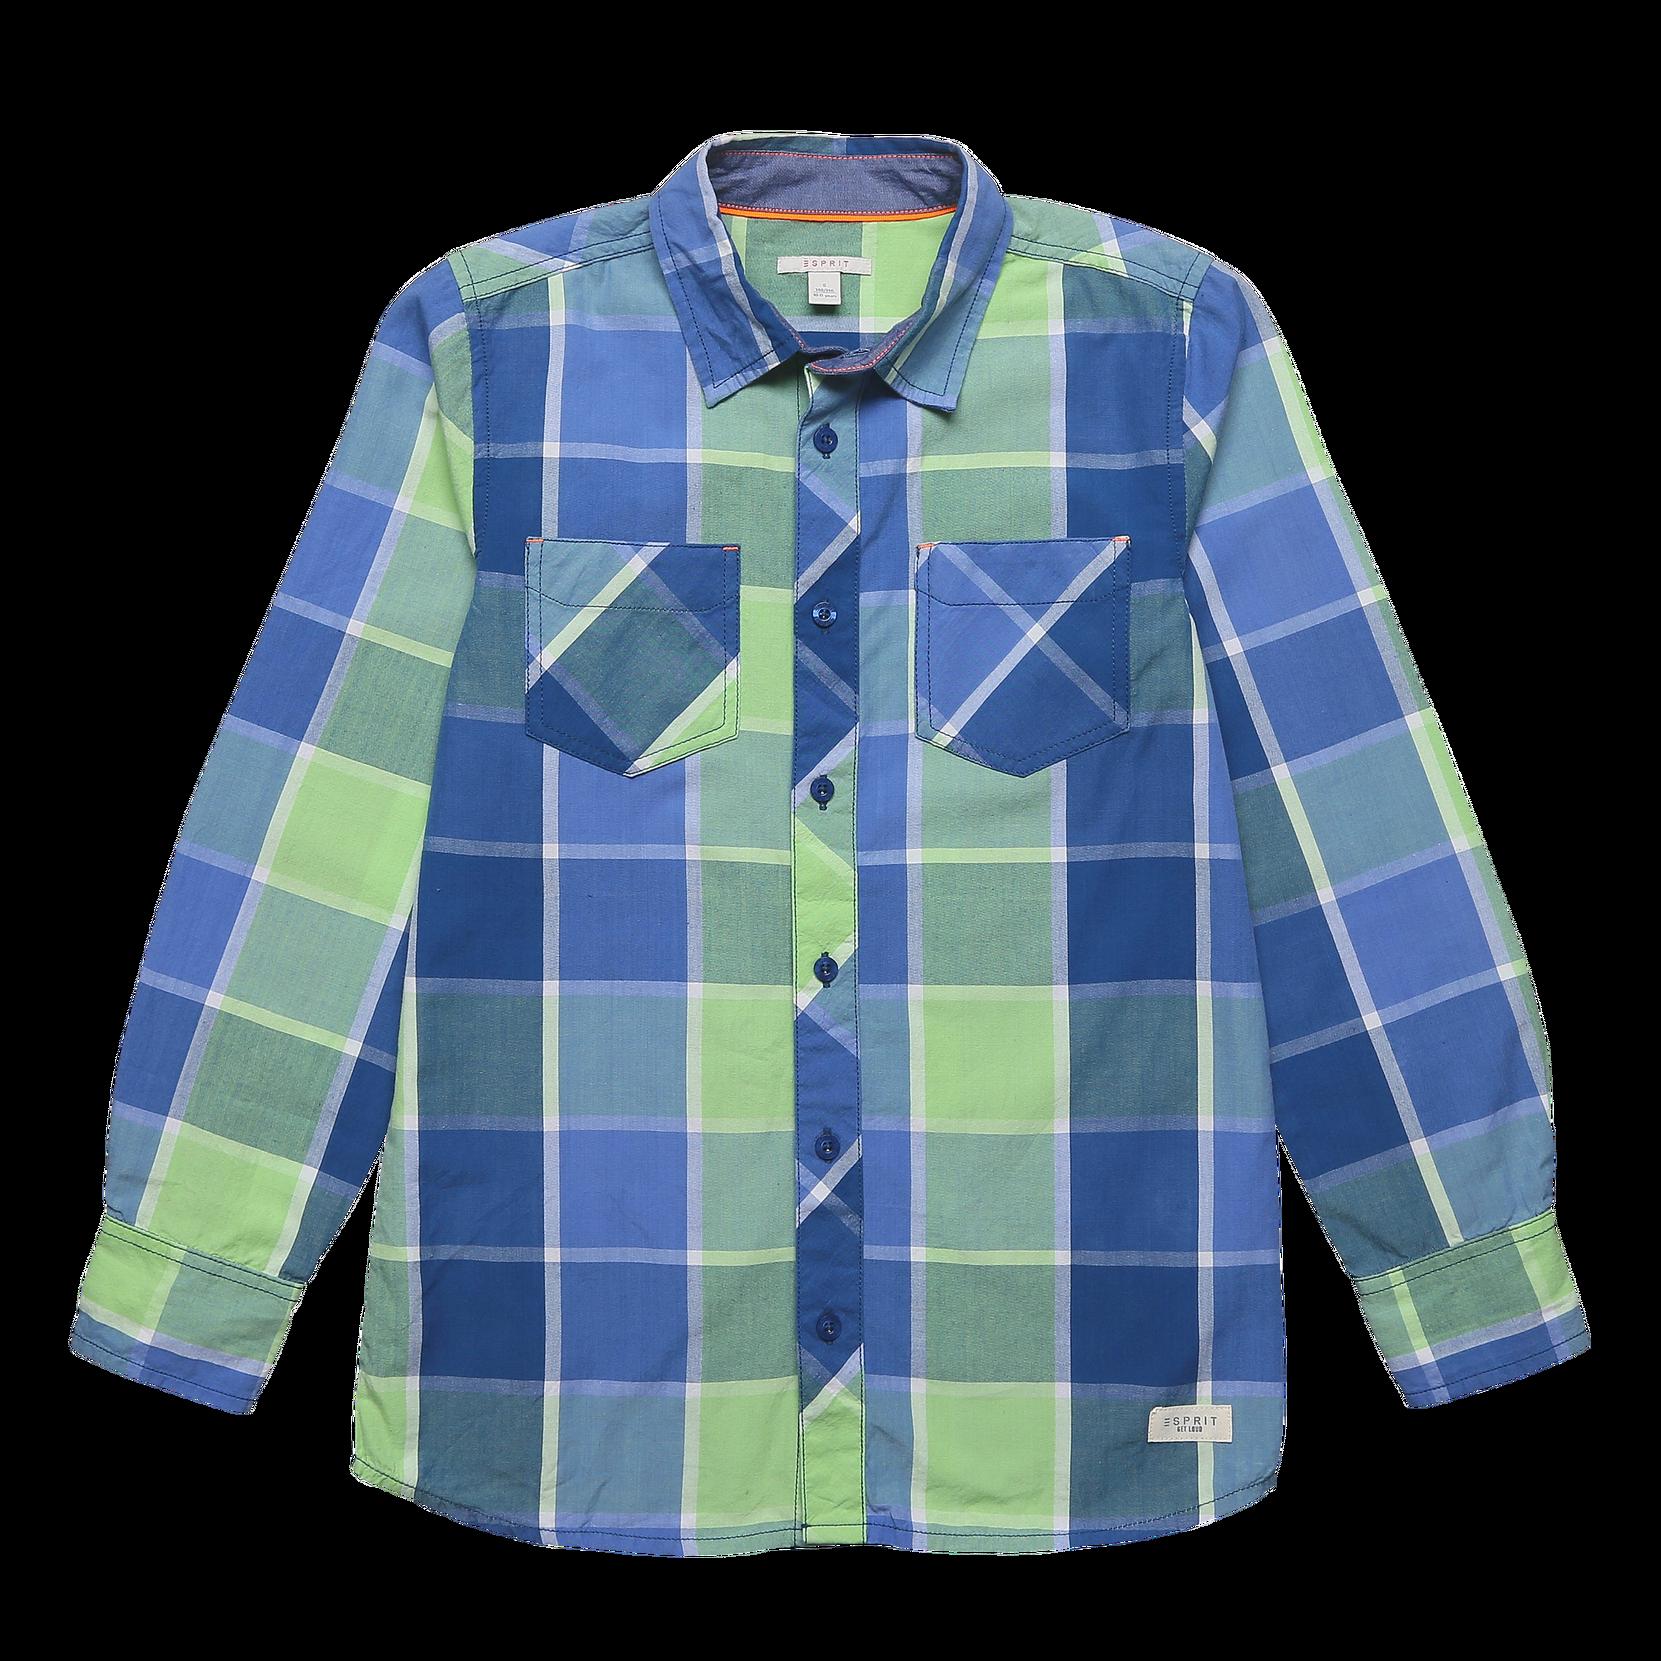 Skjorte med to lommer Esprit Skjorter til Børn i Blå/grønternet